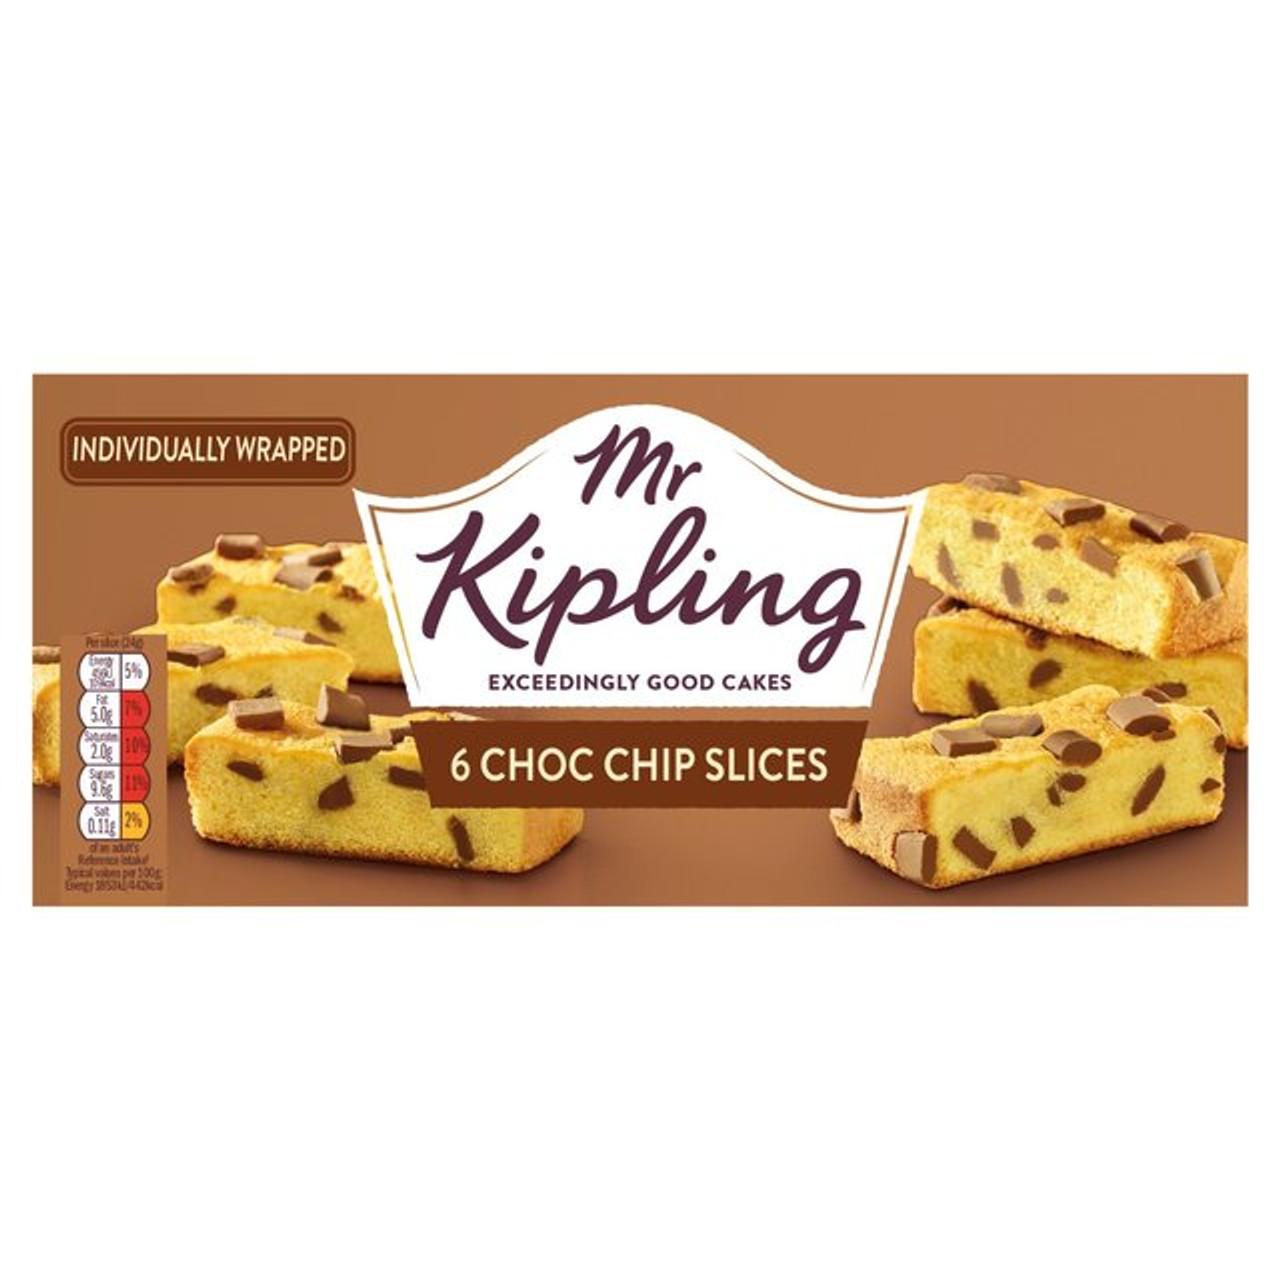 Mr Kipling Choc Chip Cake Slices